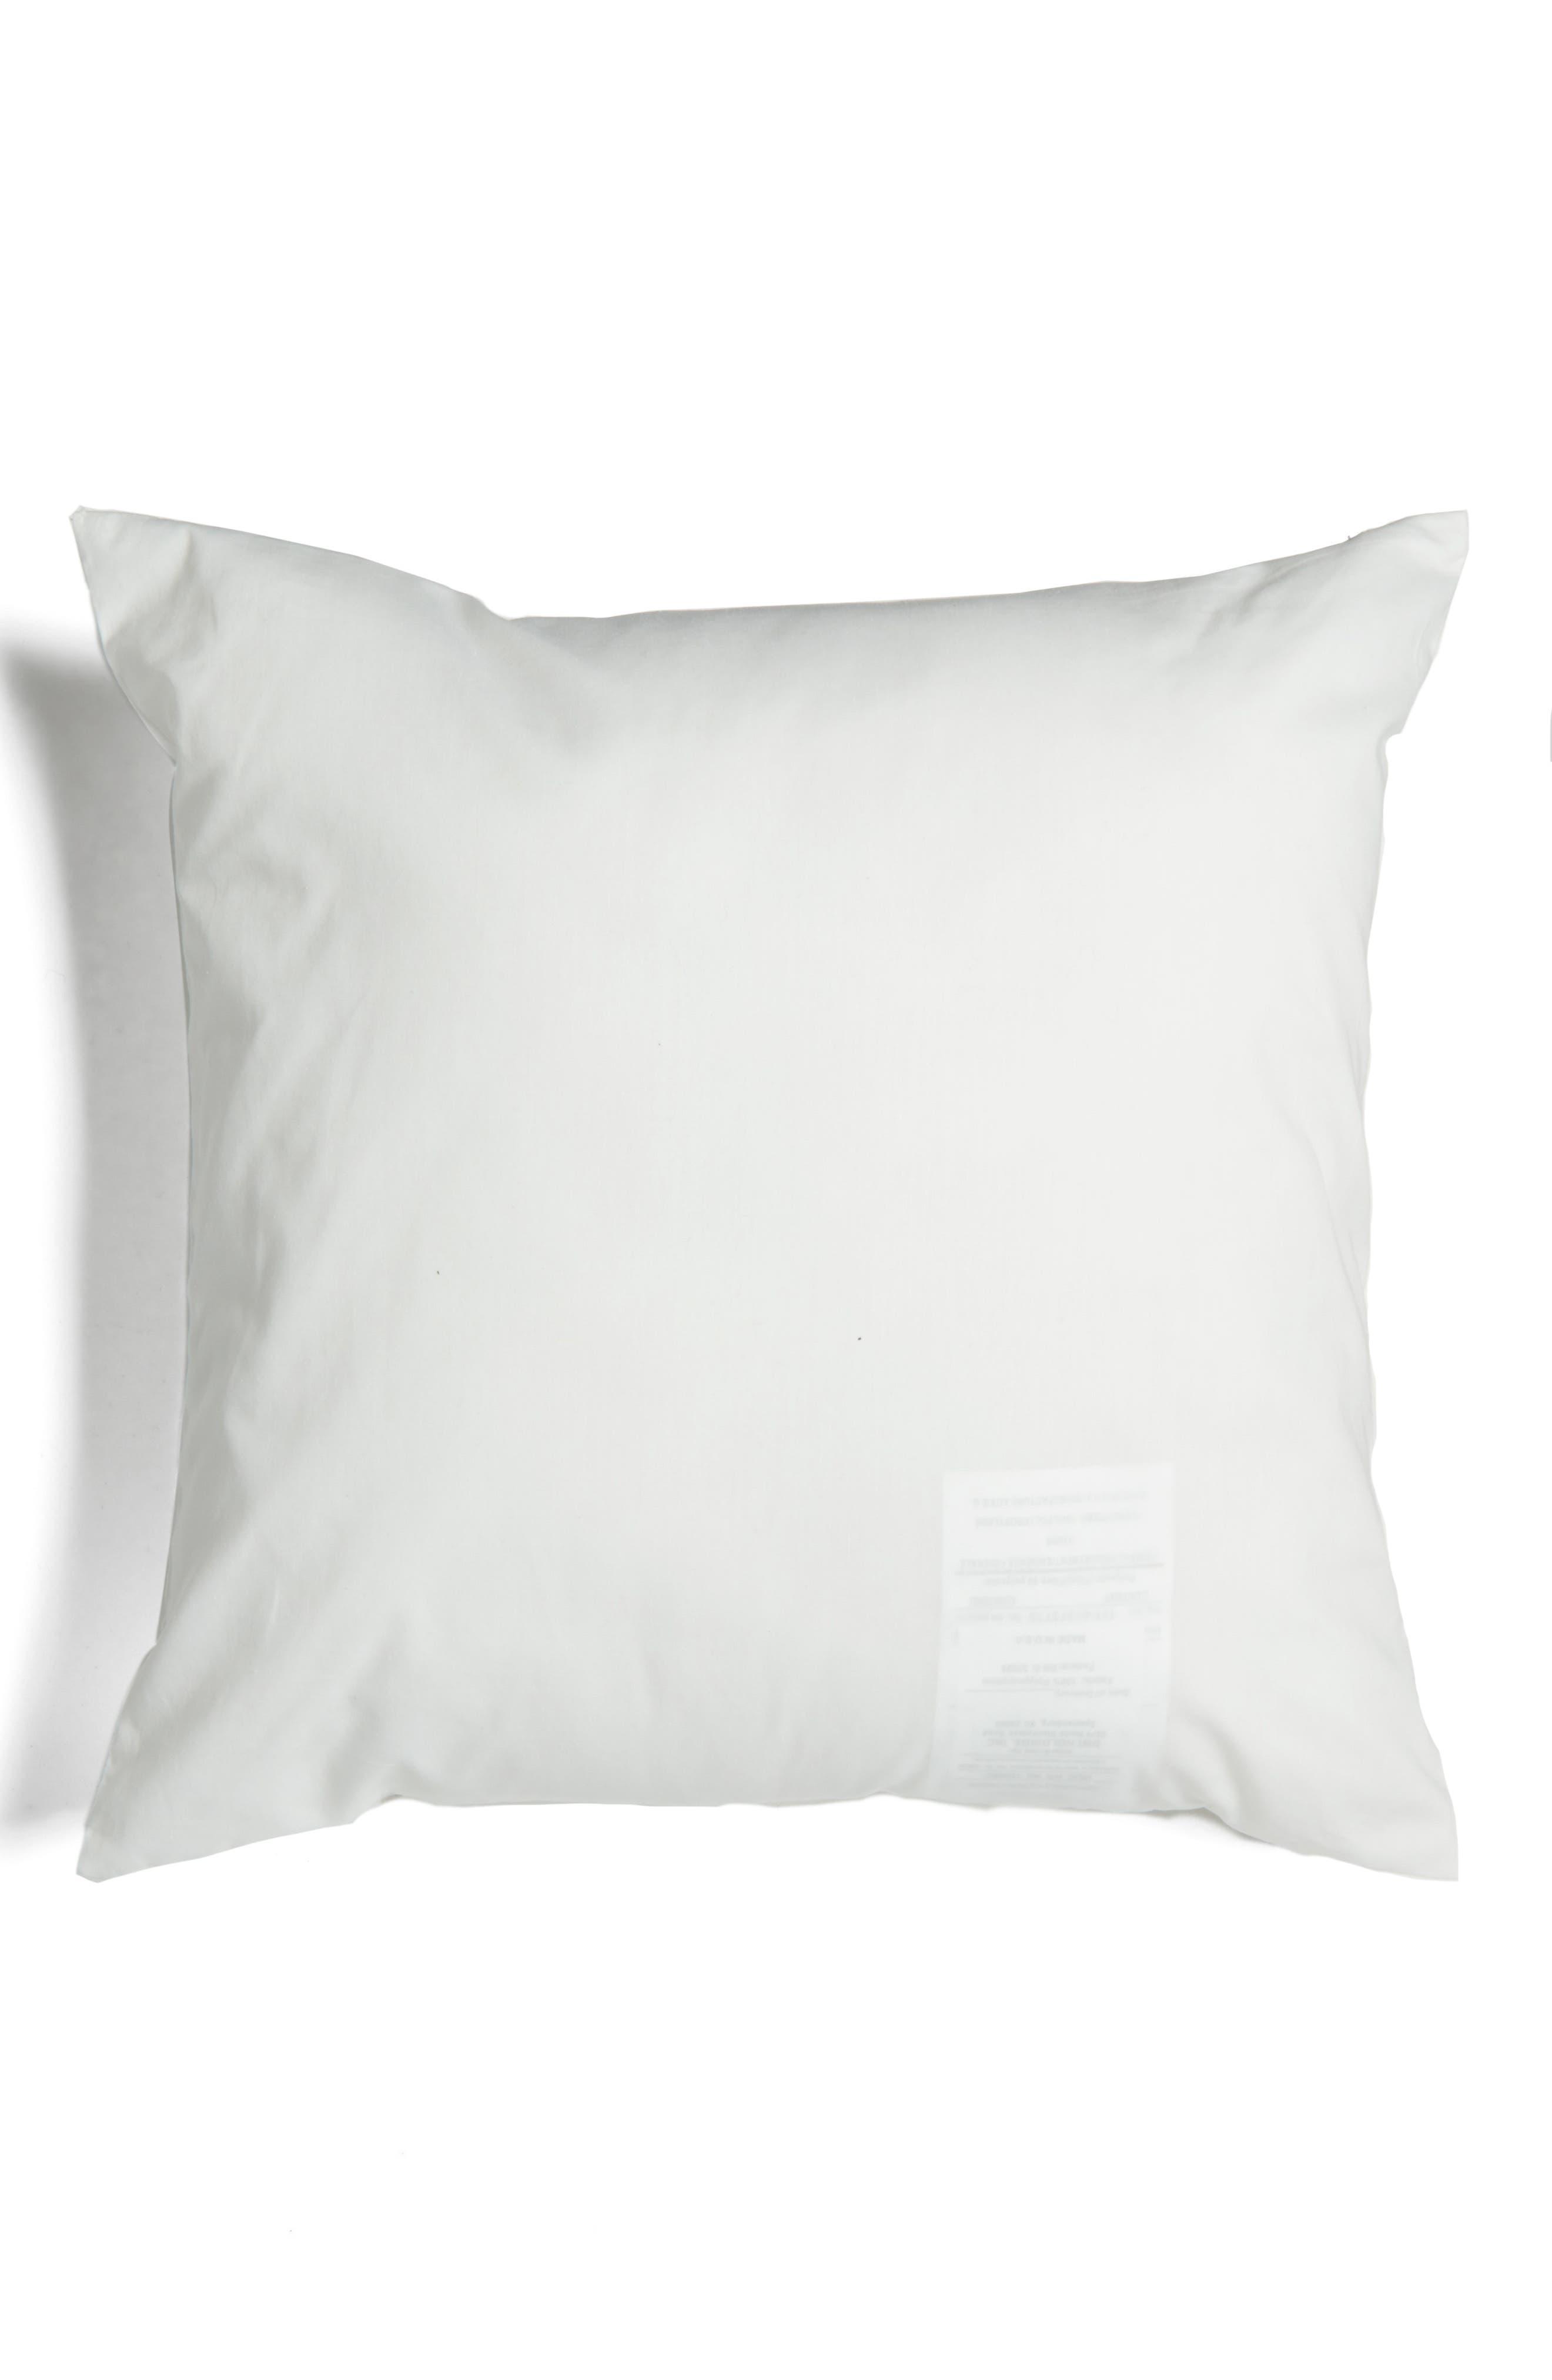 binki dot accent pillow,                             Alternate thumbnail 2, color,                             WHITE/ PLATINUM